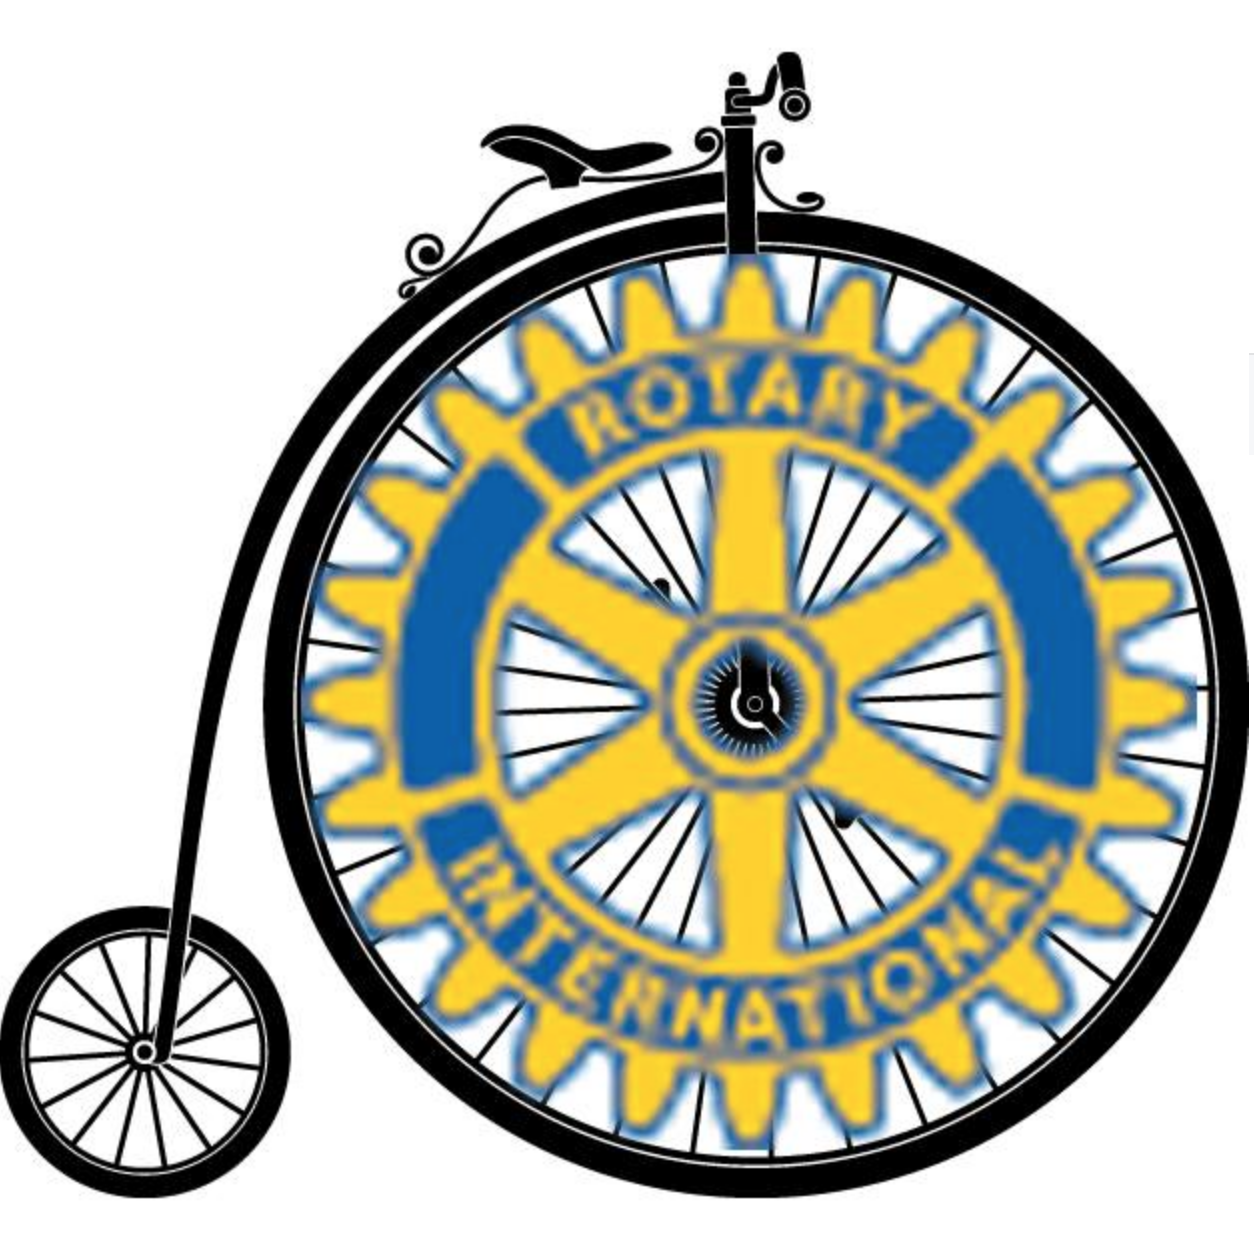 Davis Rotary Club